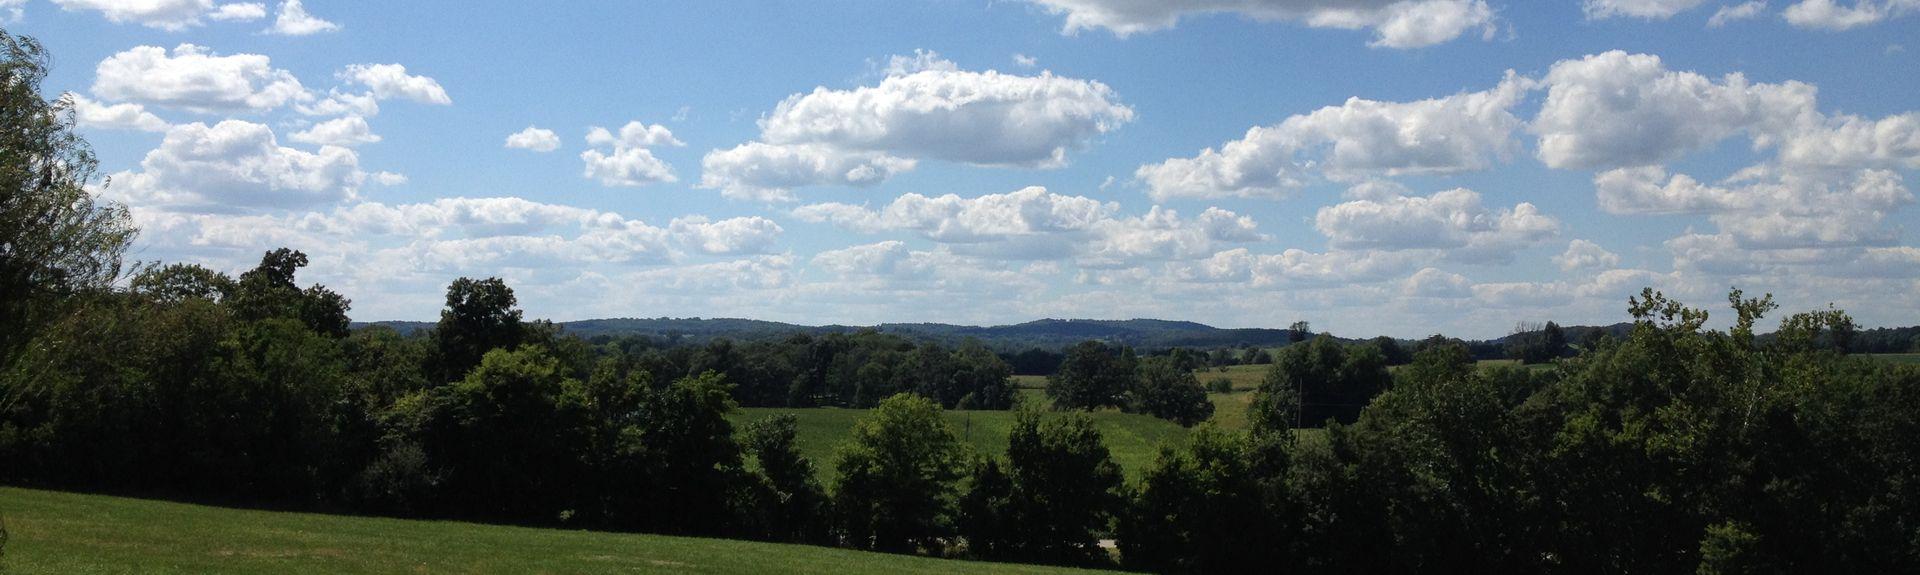 Stone Hill Winery, Hermann, Missouri, United States of America